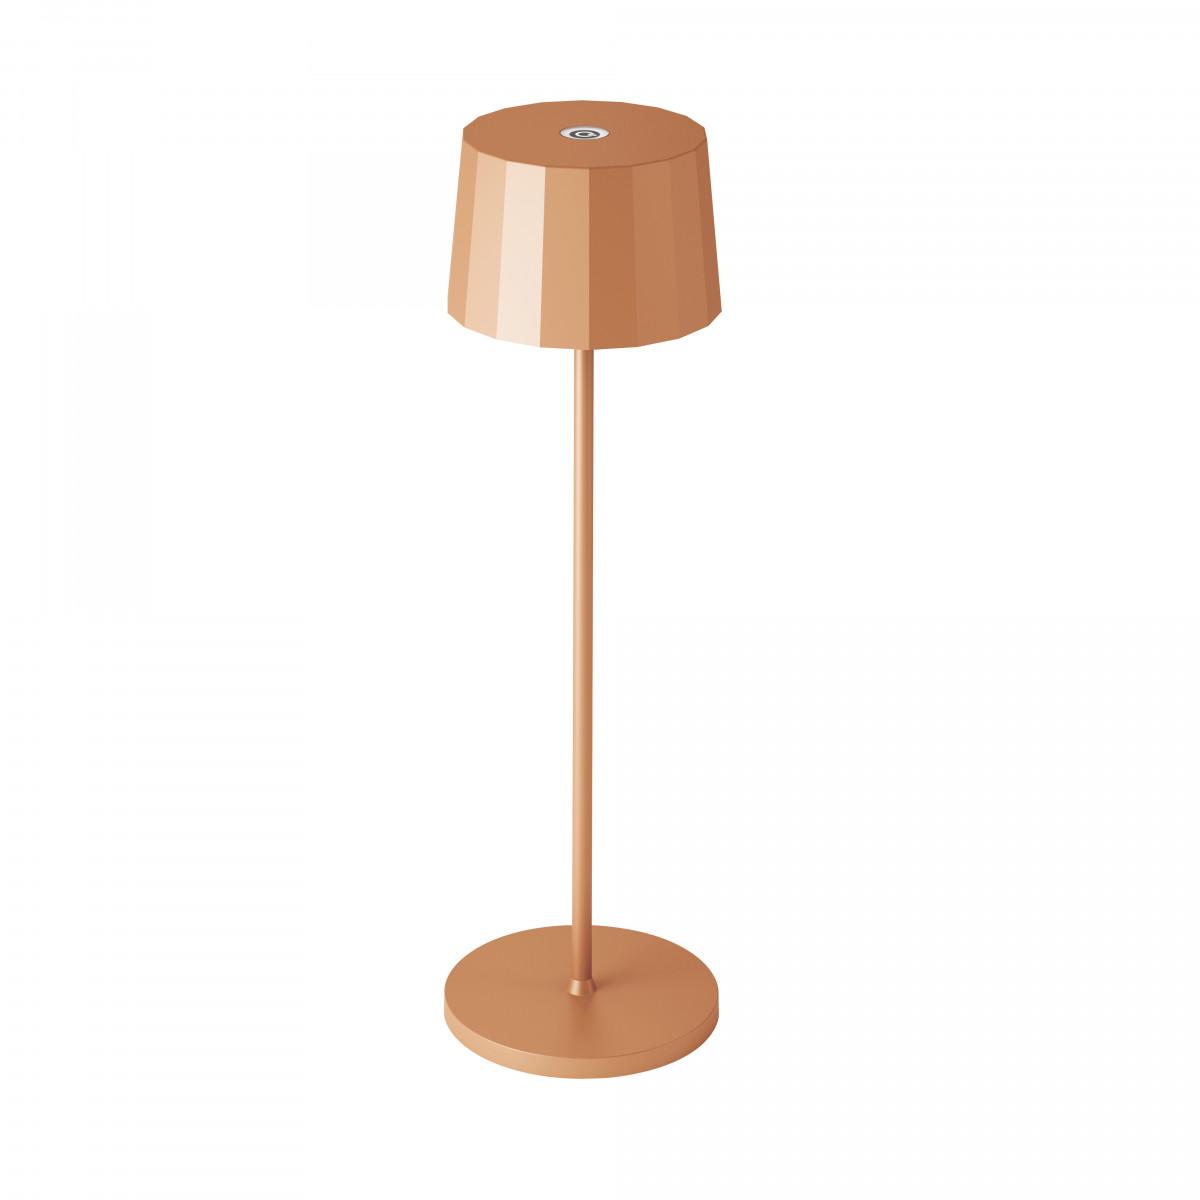 Tafellamp Lido Touch Perzik Oranje met USB